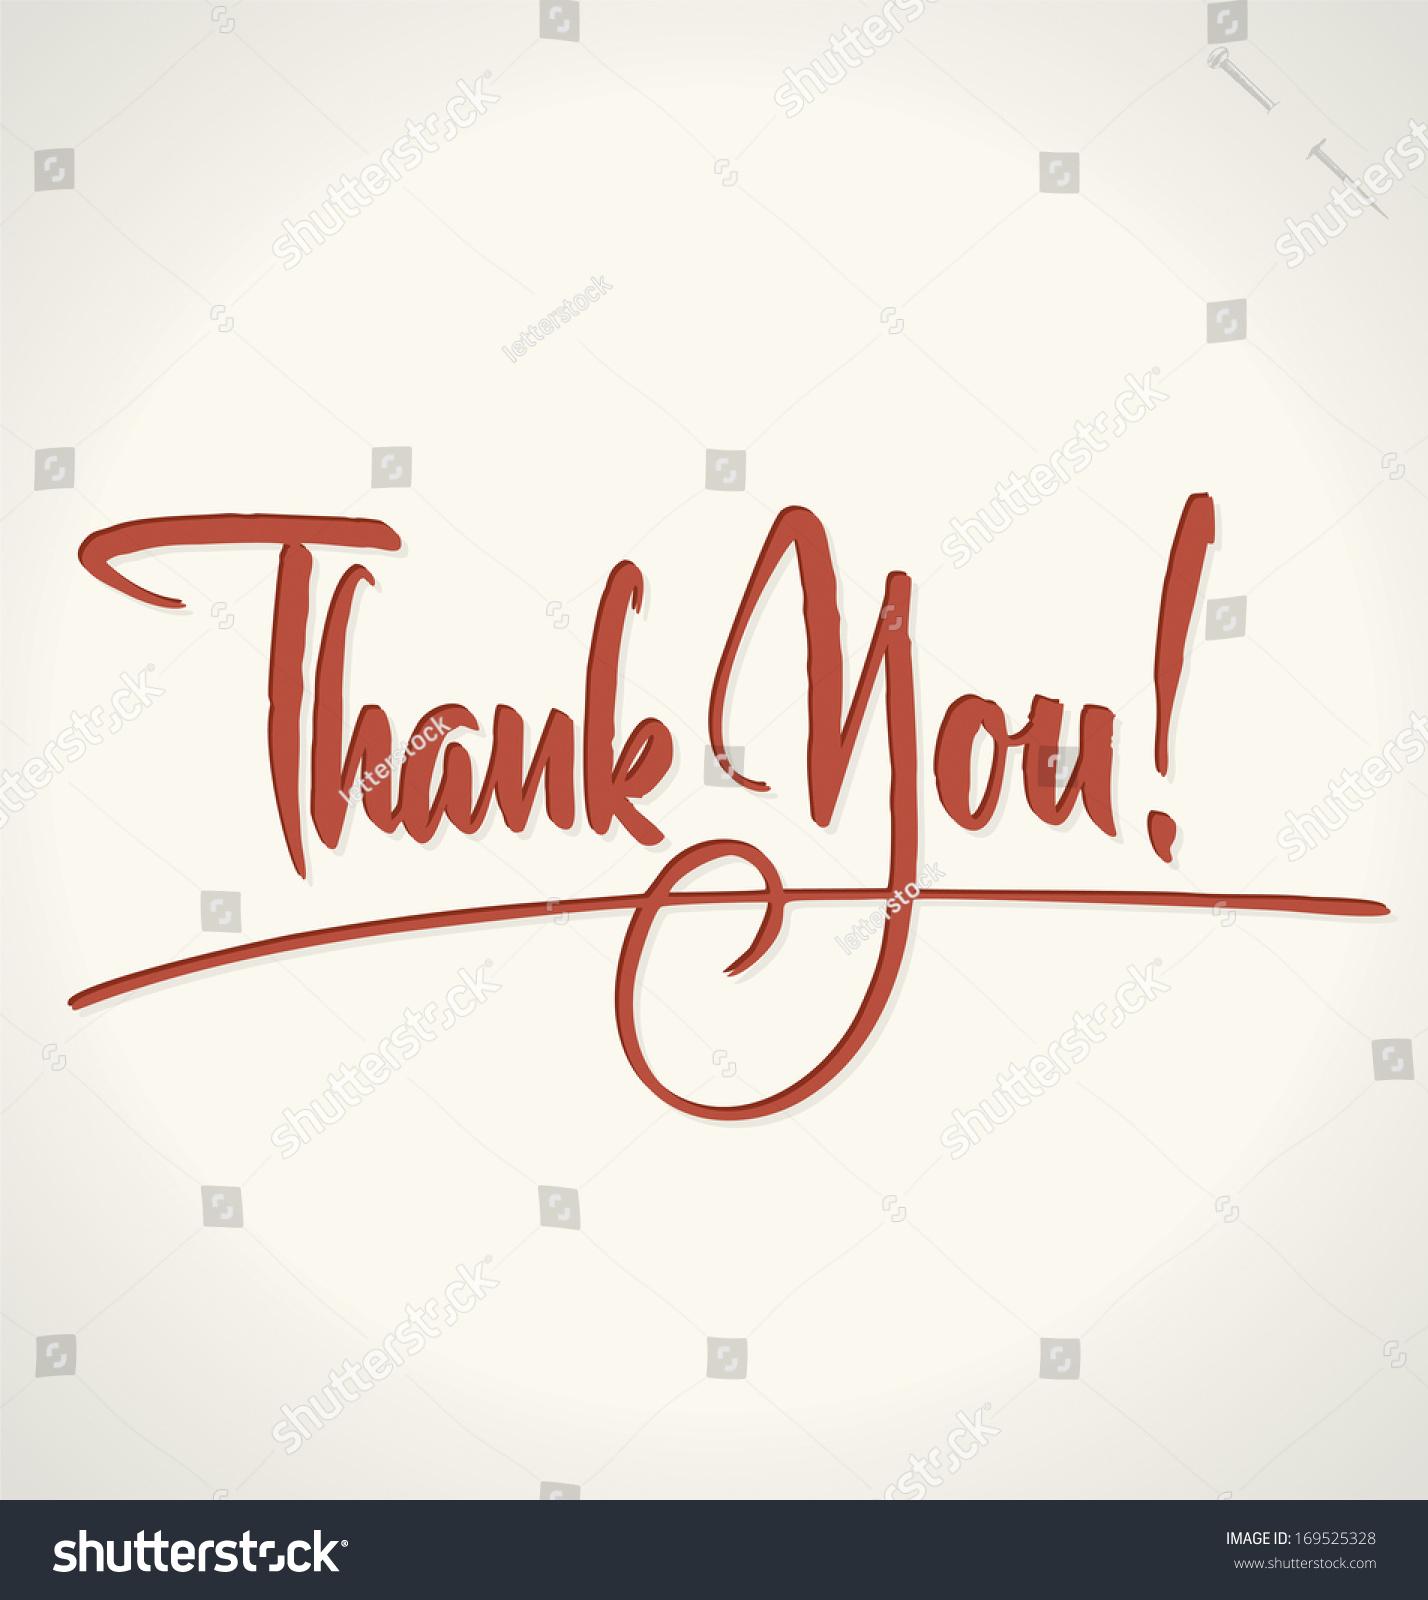 Thank you hand lettering custom handmade stock vector